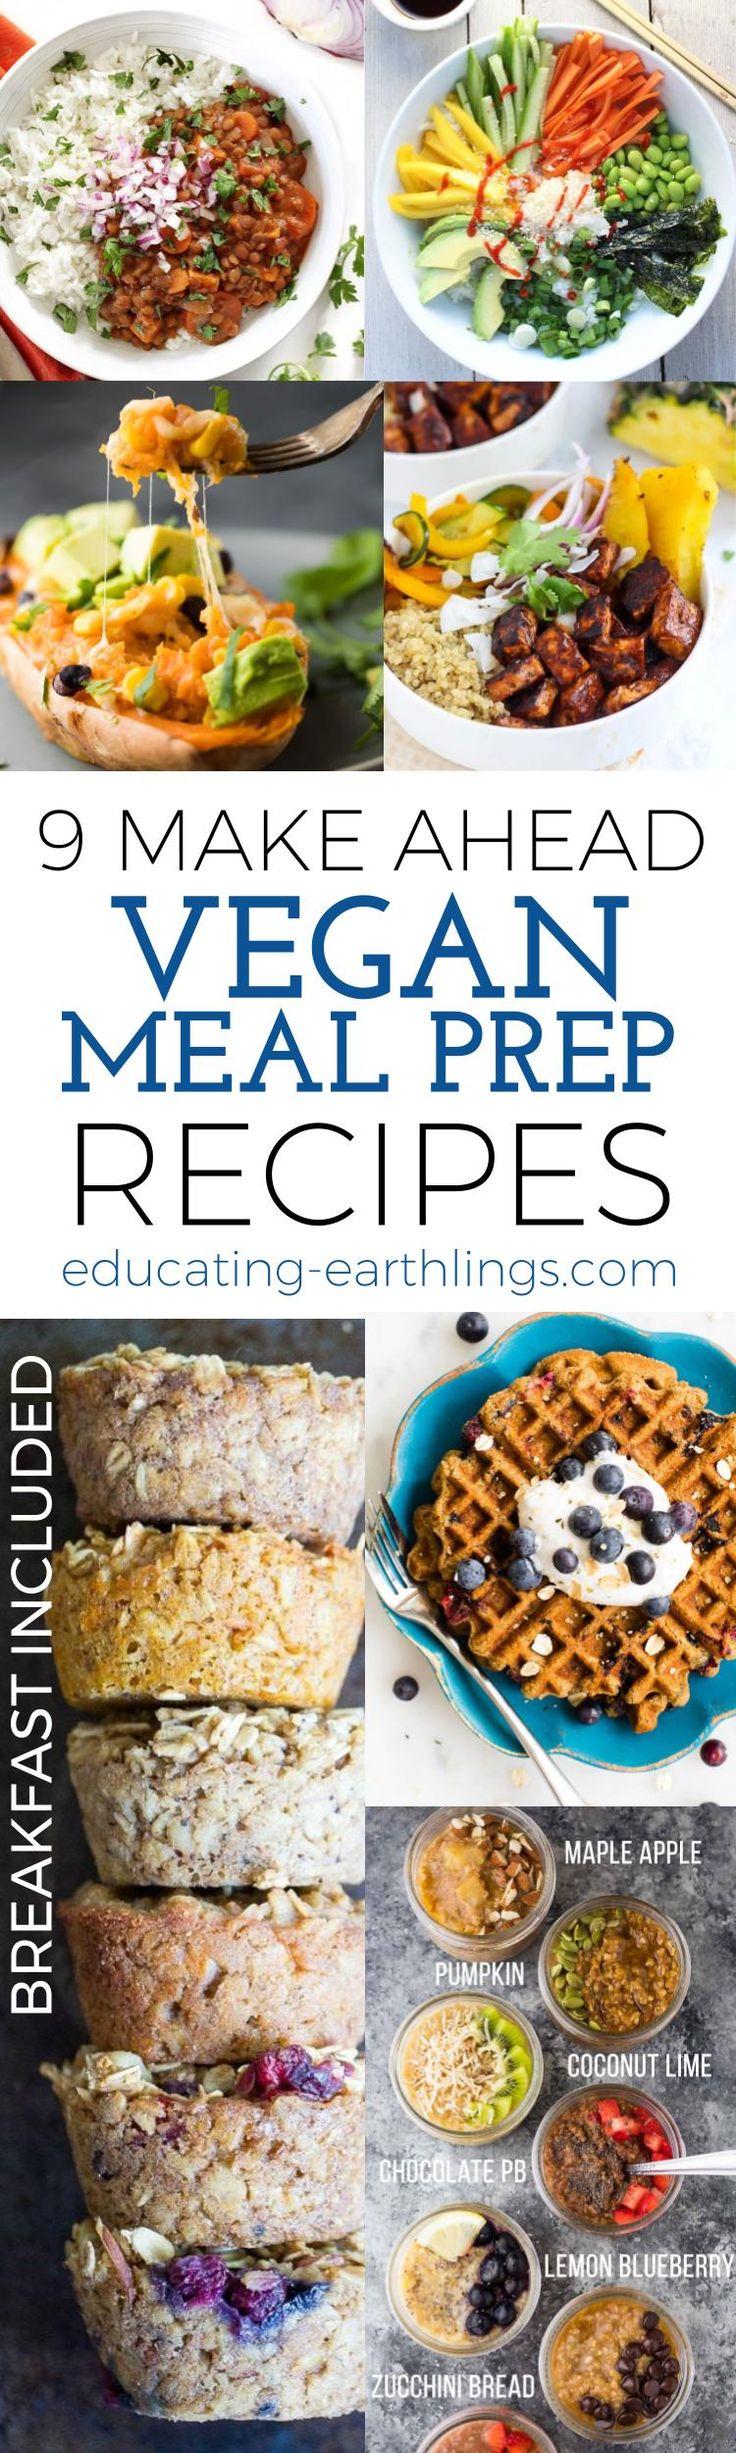 9 Make Ahead Vegan Meal Plan Ideas